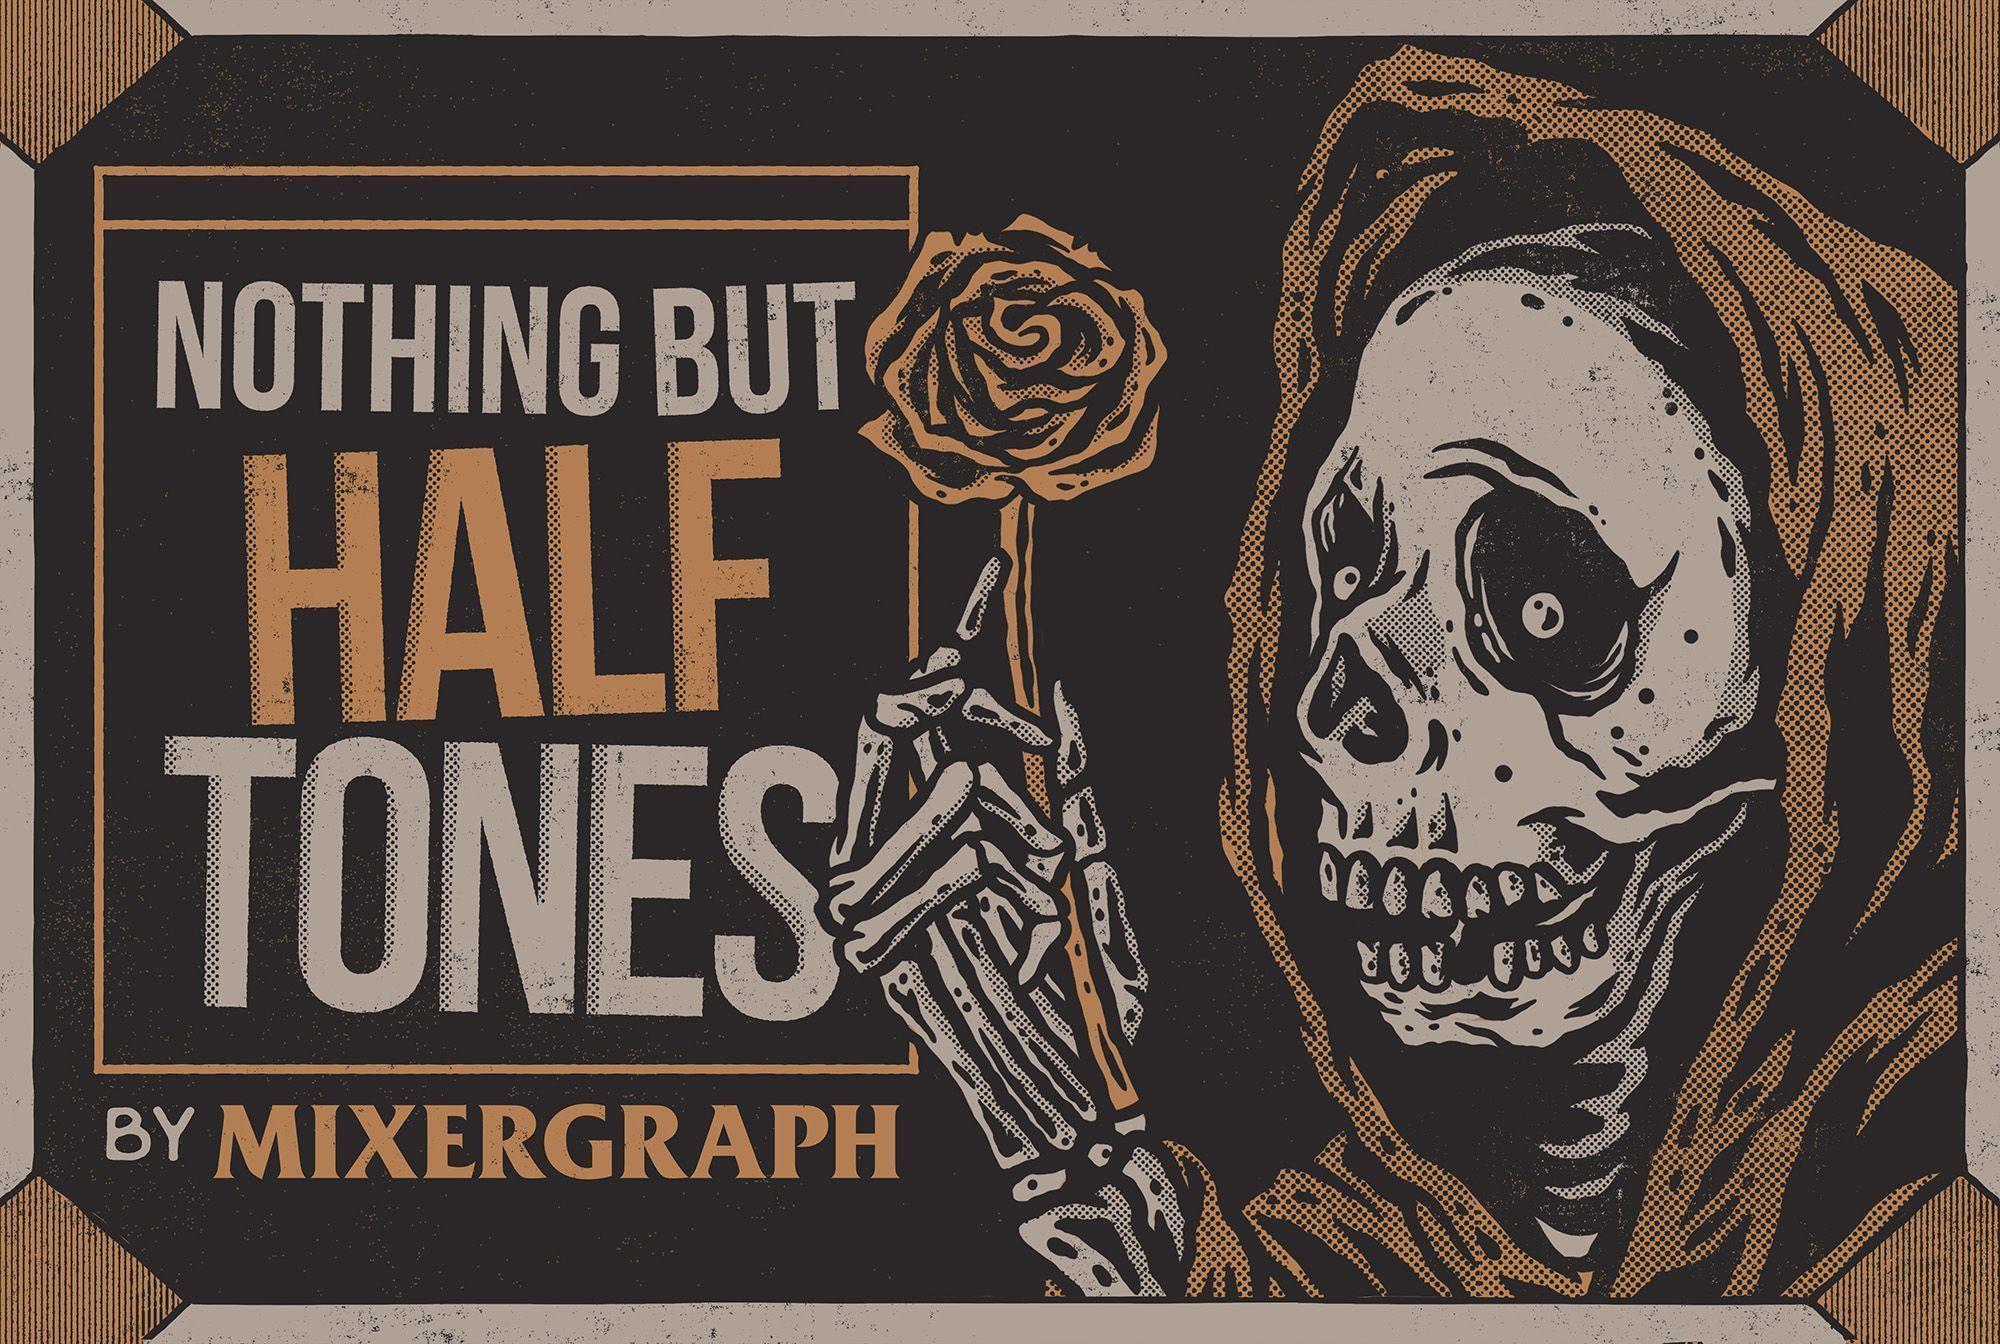 Mixergraph Nothing but Halftones